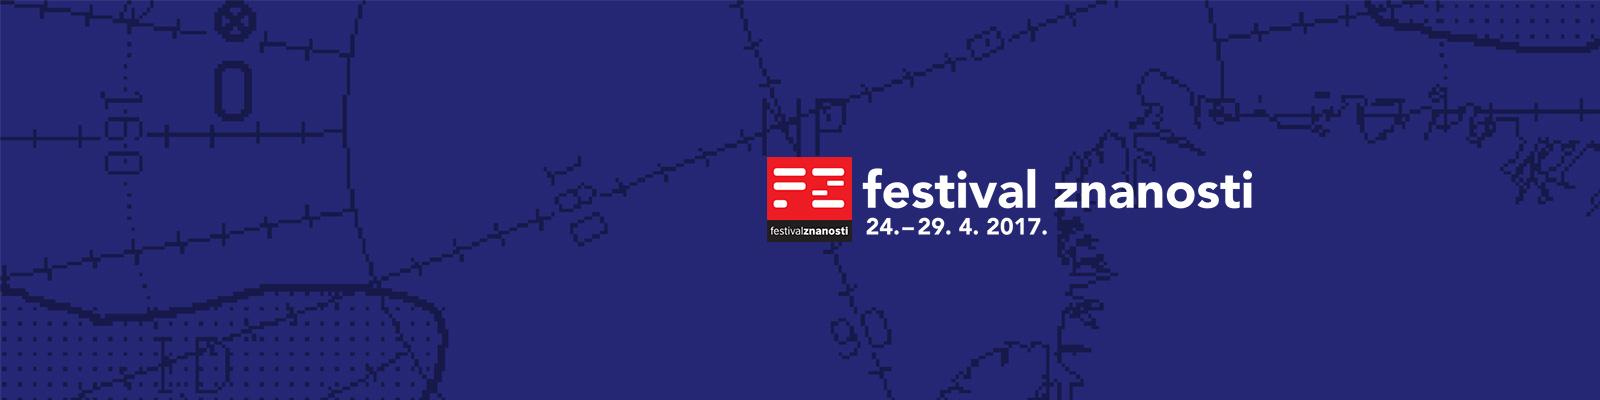 Raspored festivala znanosti